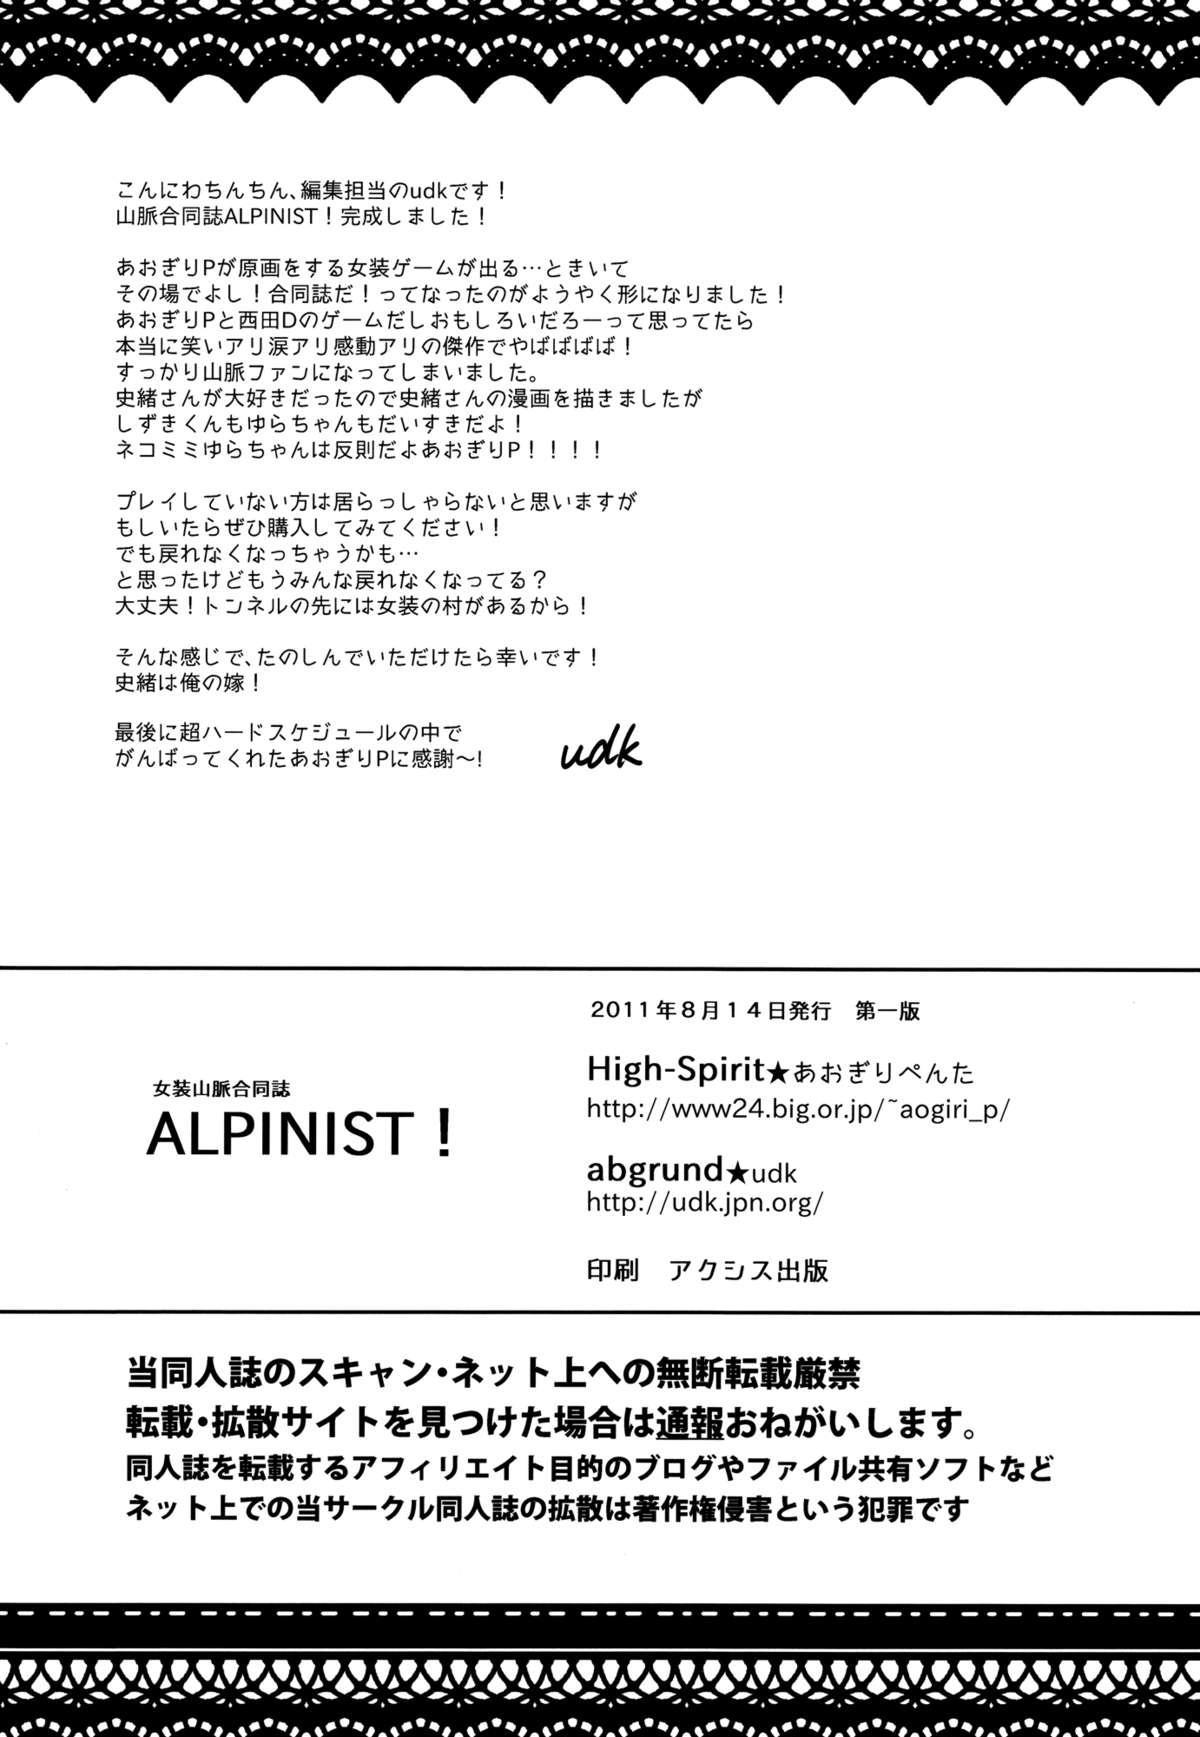 ALPINIST! 34